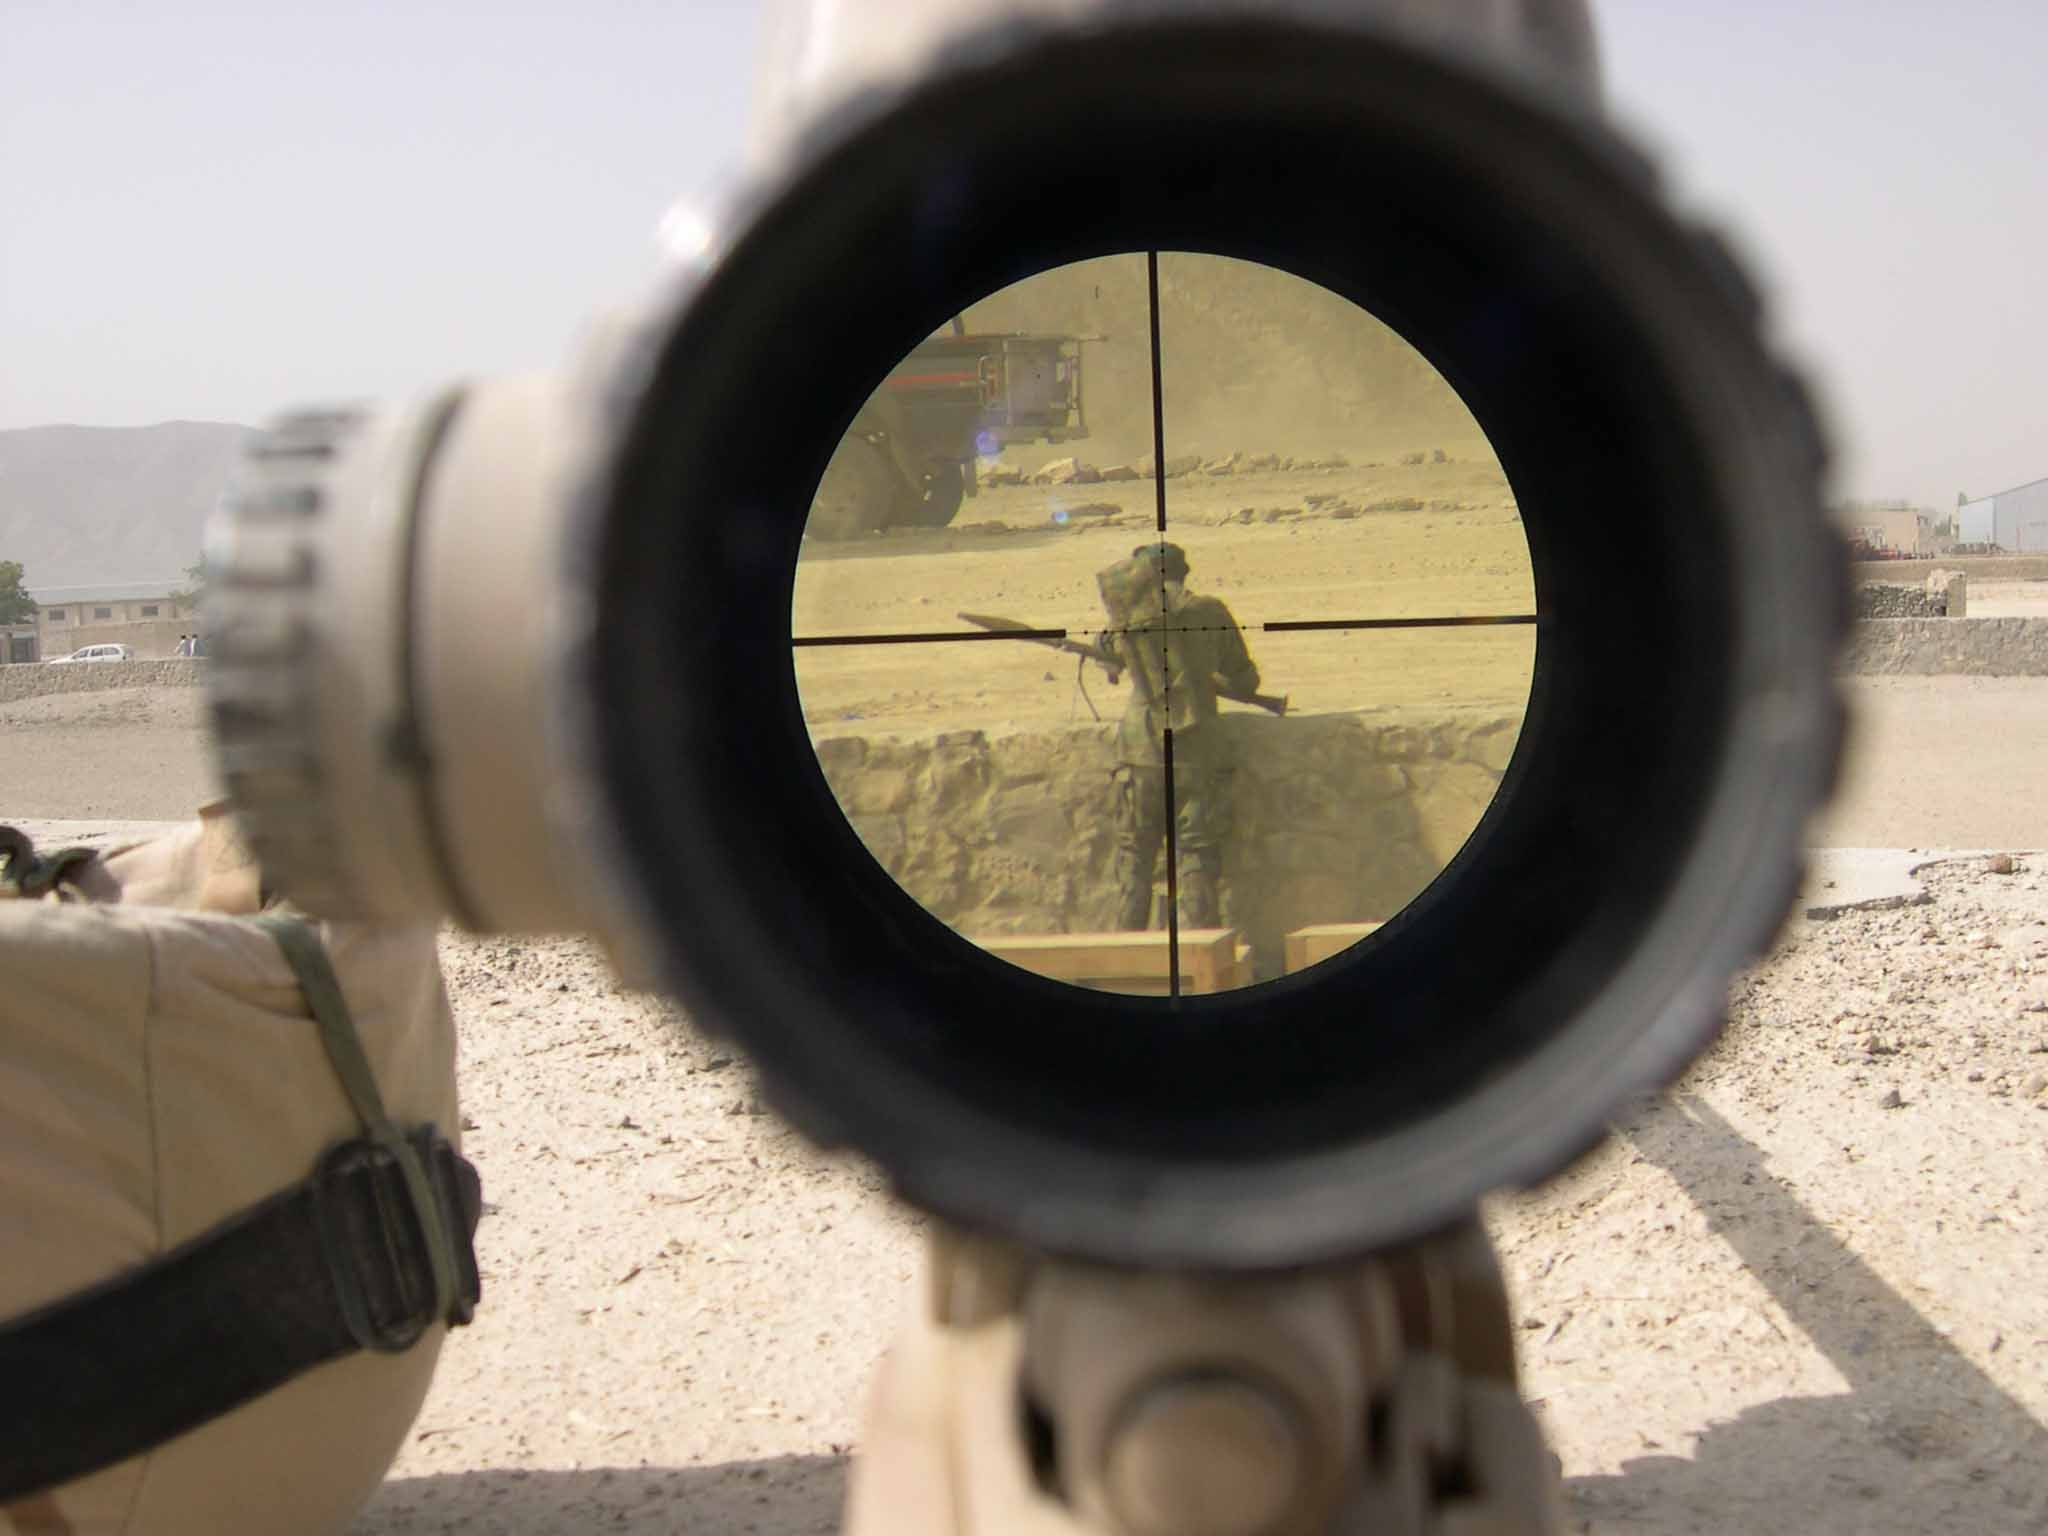 Hd Desktop Wallpaper scope sol rs military sniper rifles